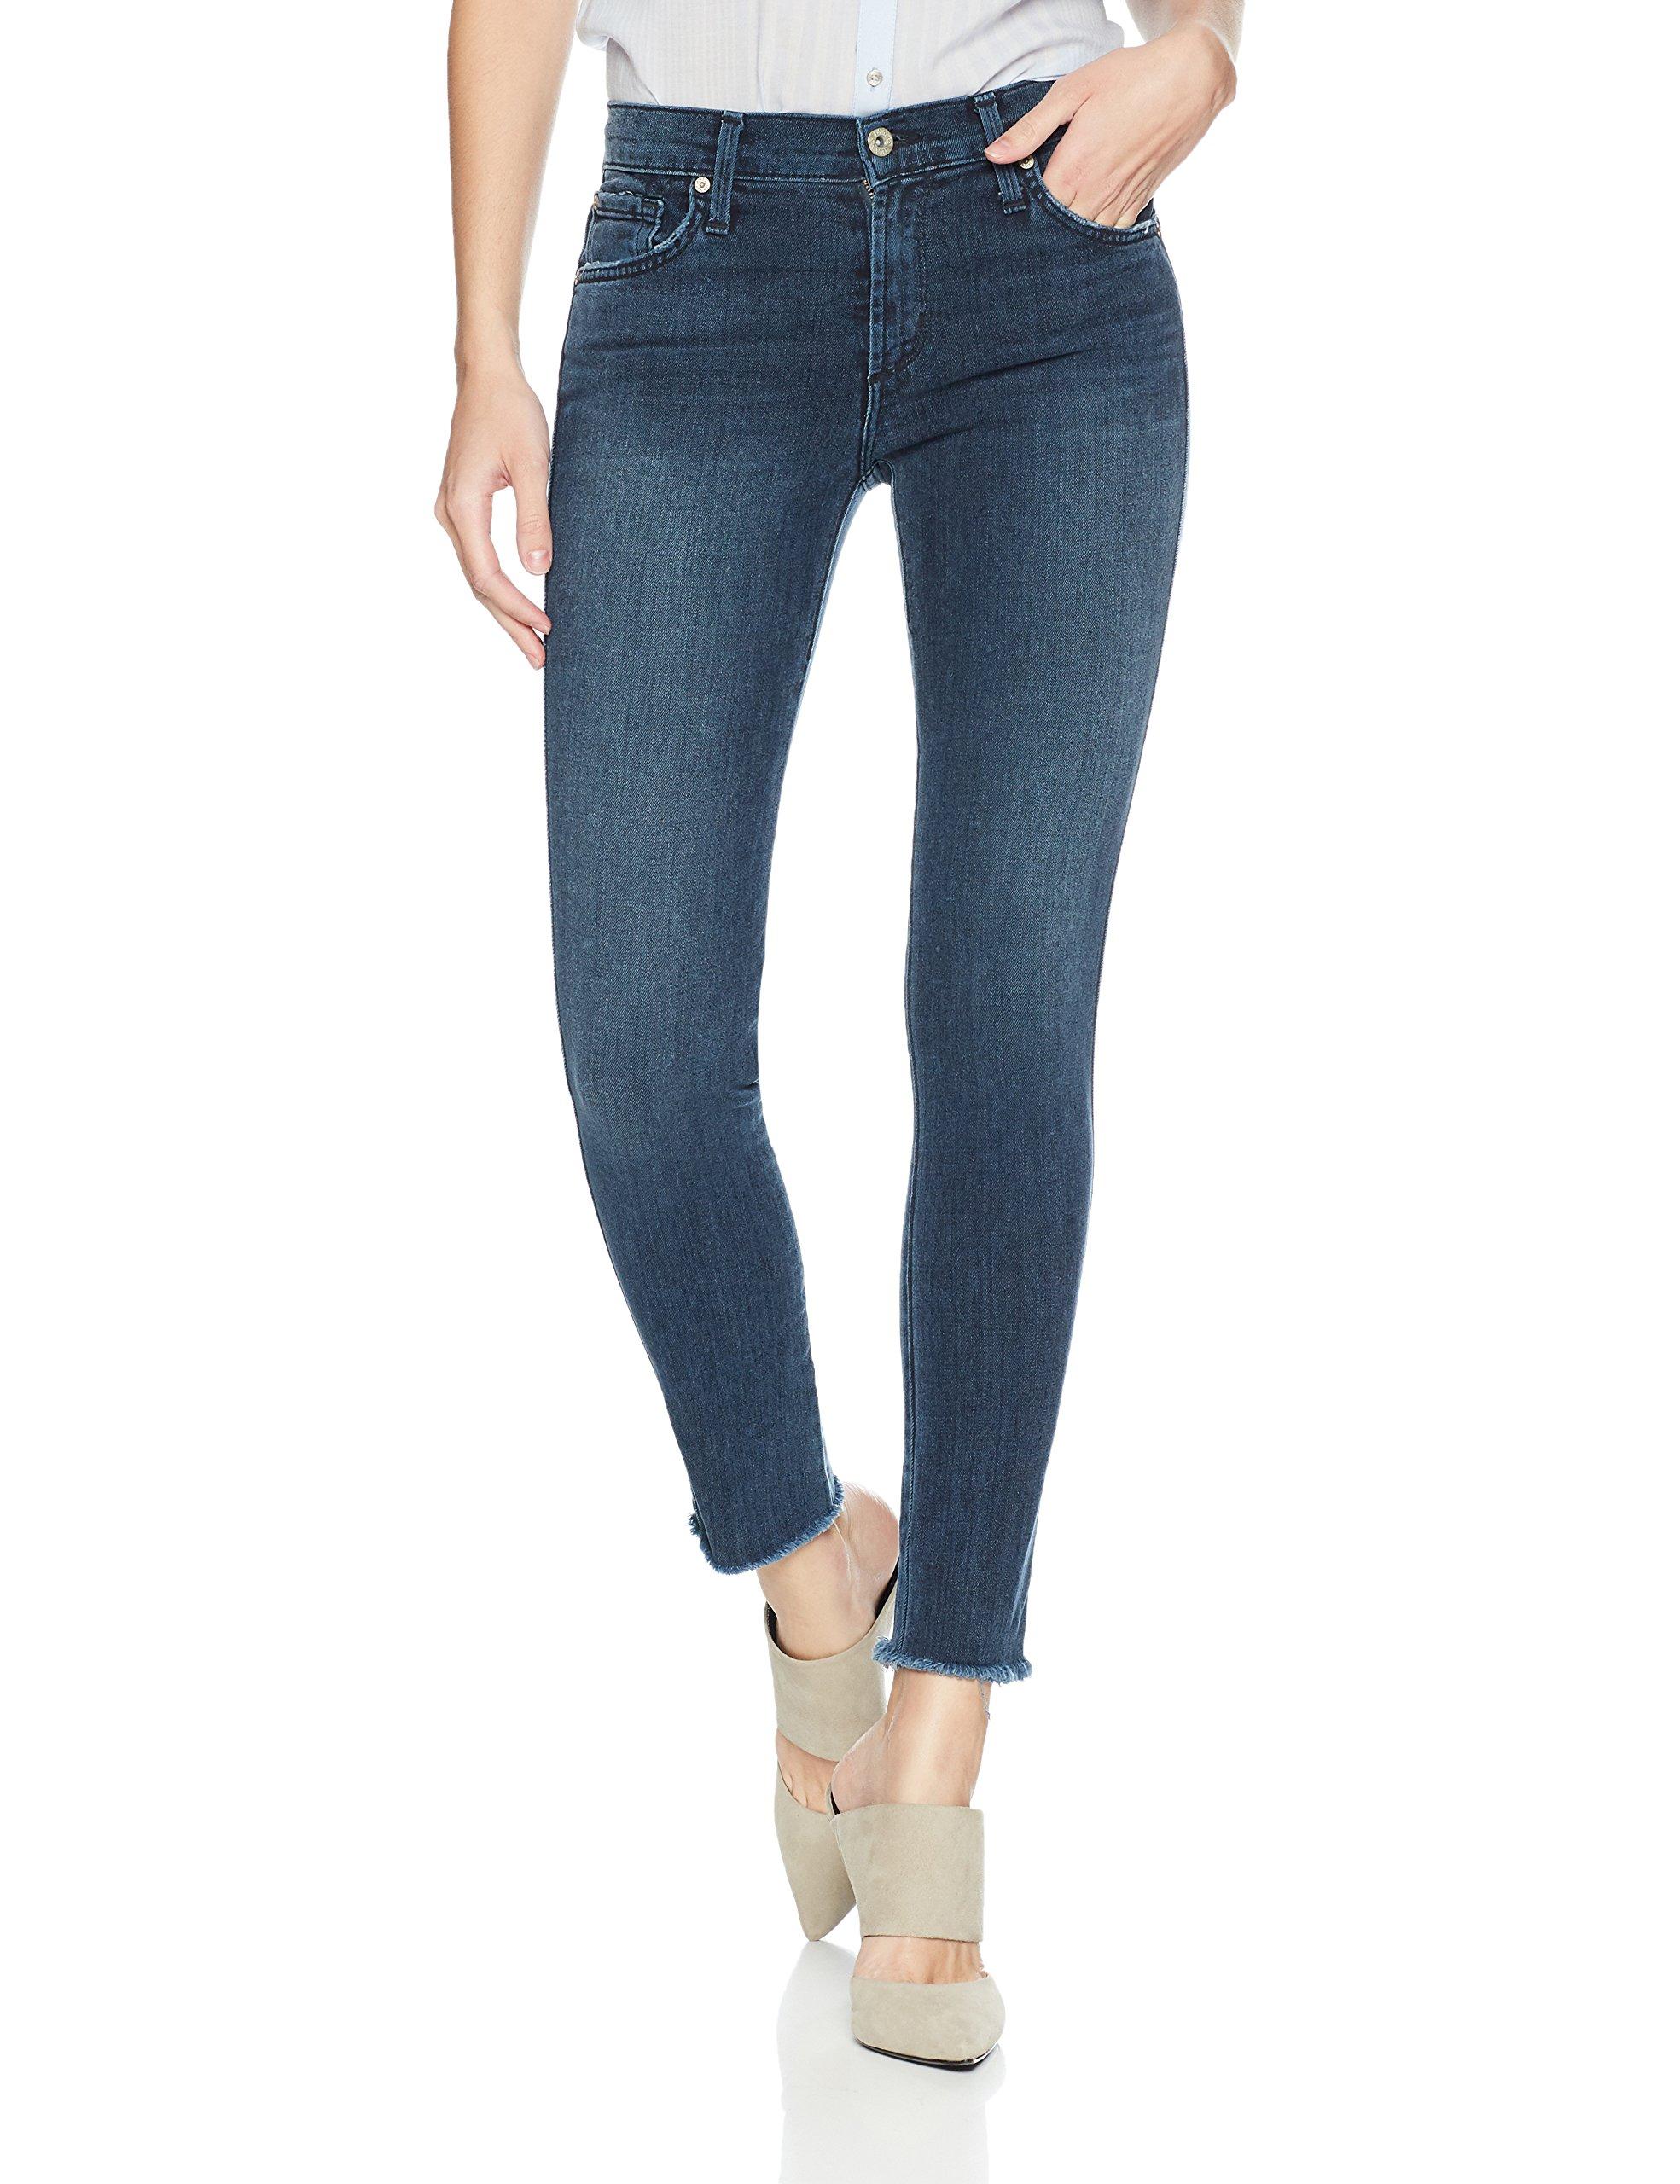 James Jeans Women's Twiggy Ankle Length Skinny Jean In Dynasty Clean, Dynasty CLN, 27